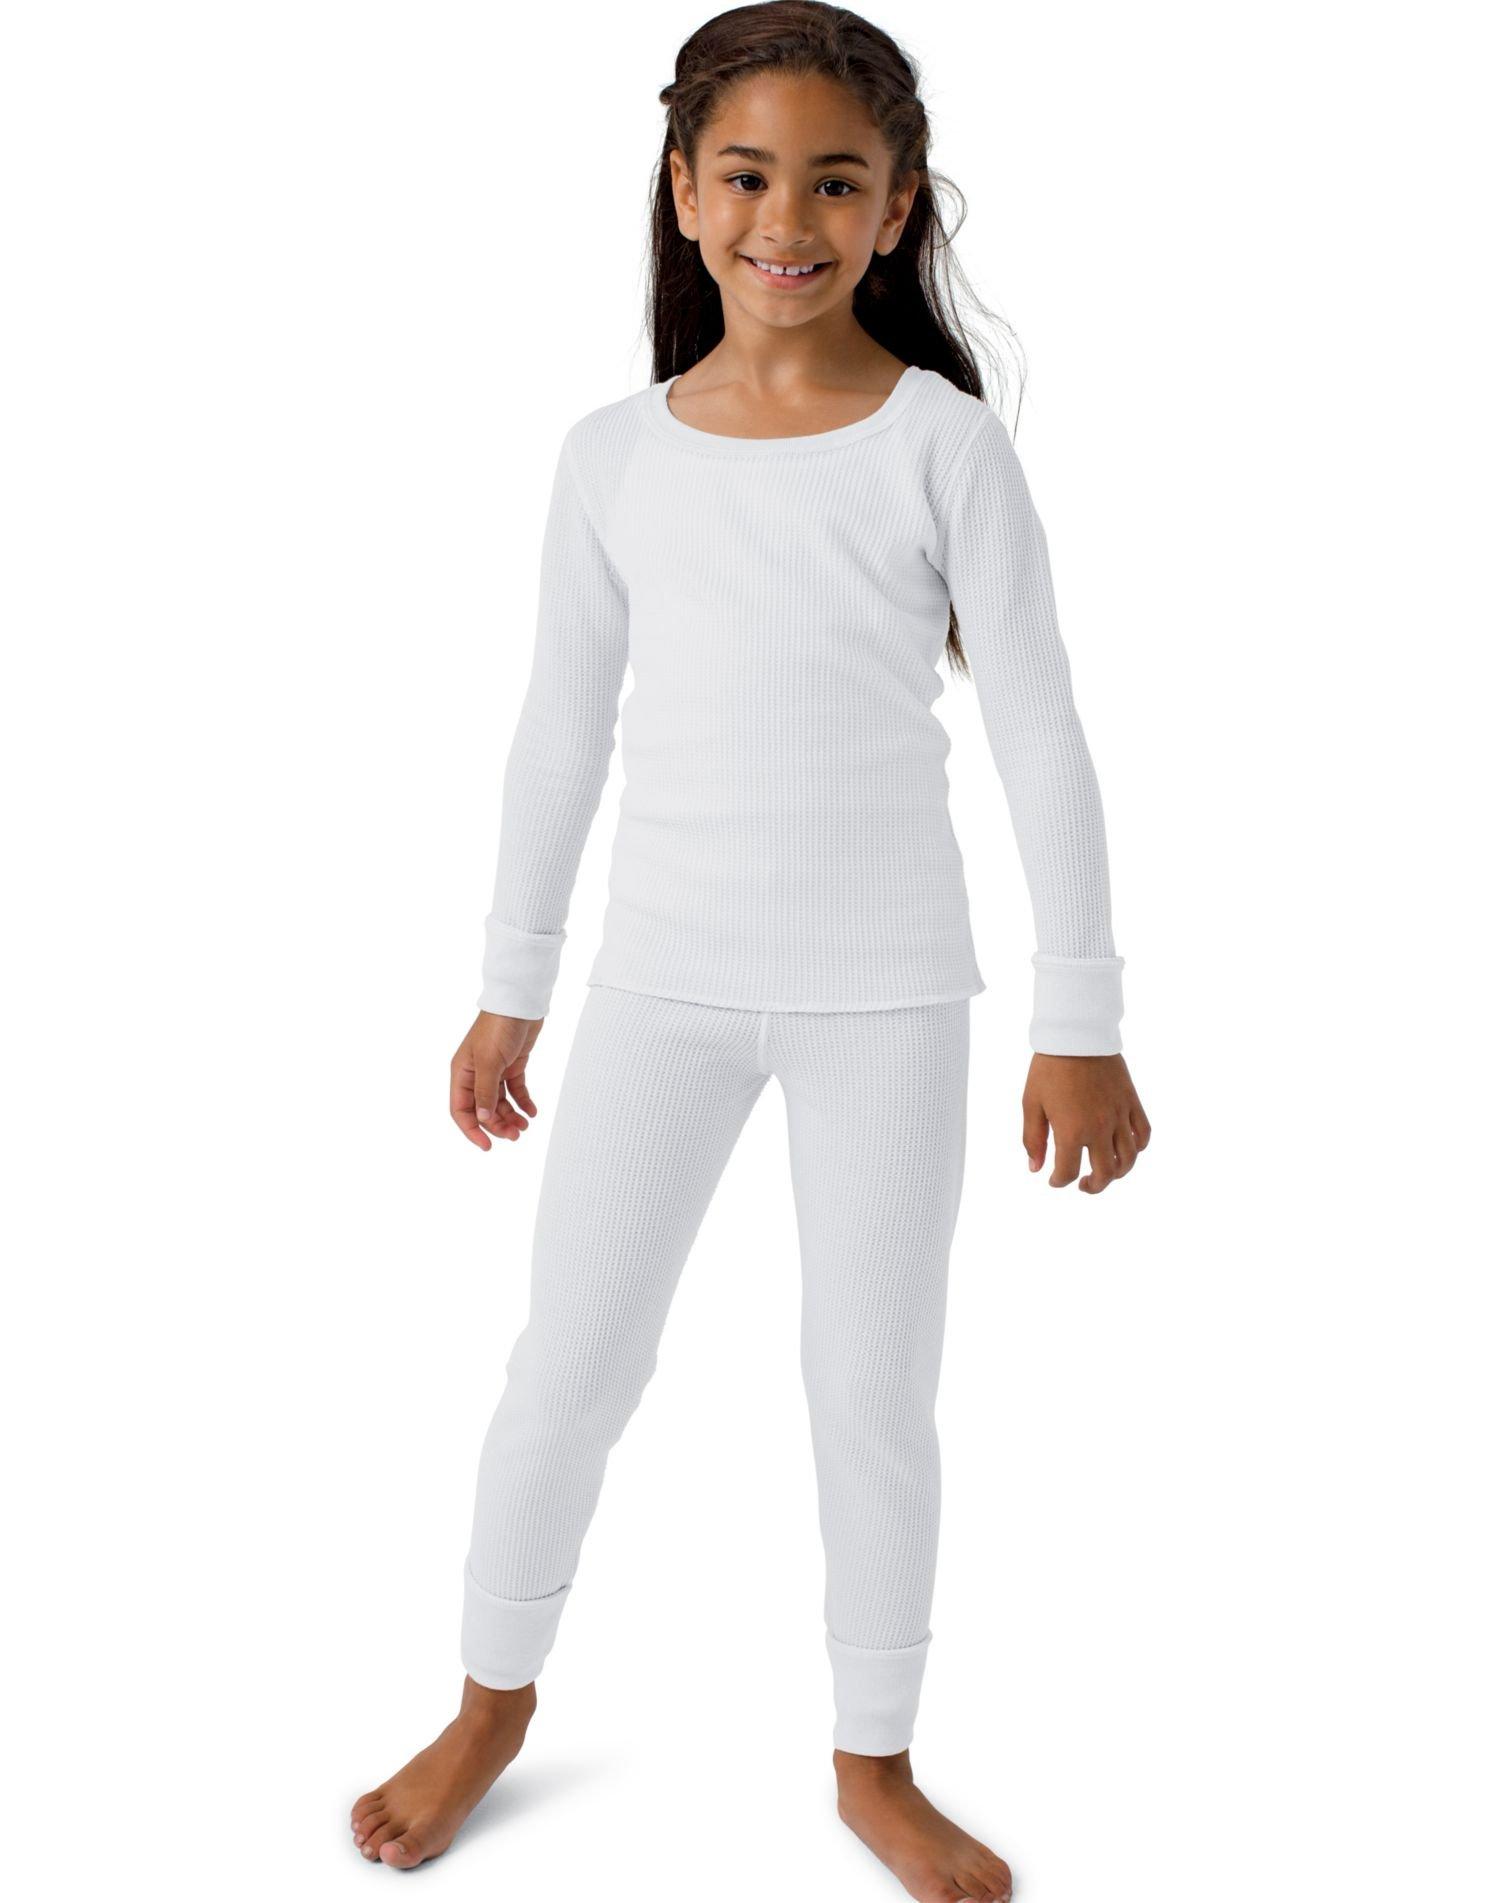 Hanes Girls' X-Temp Thermal Set White M by Hanes (Image #1)